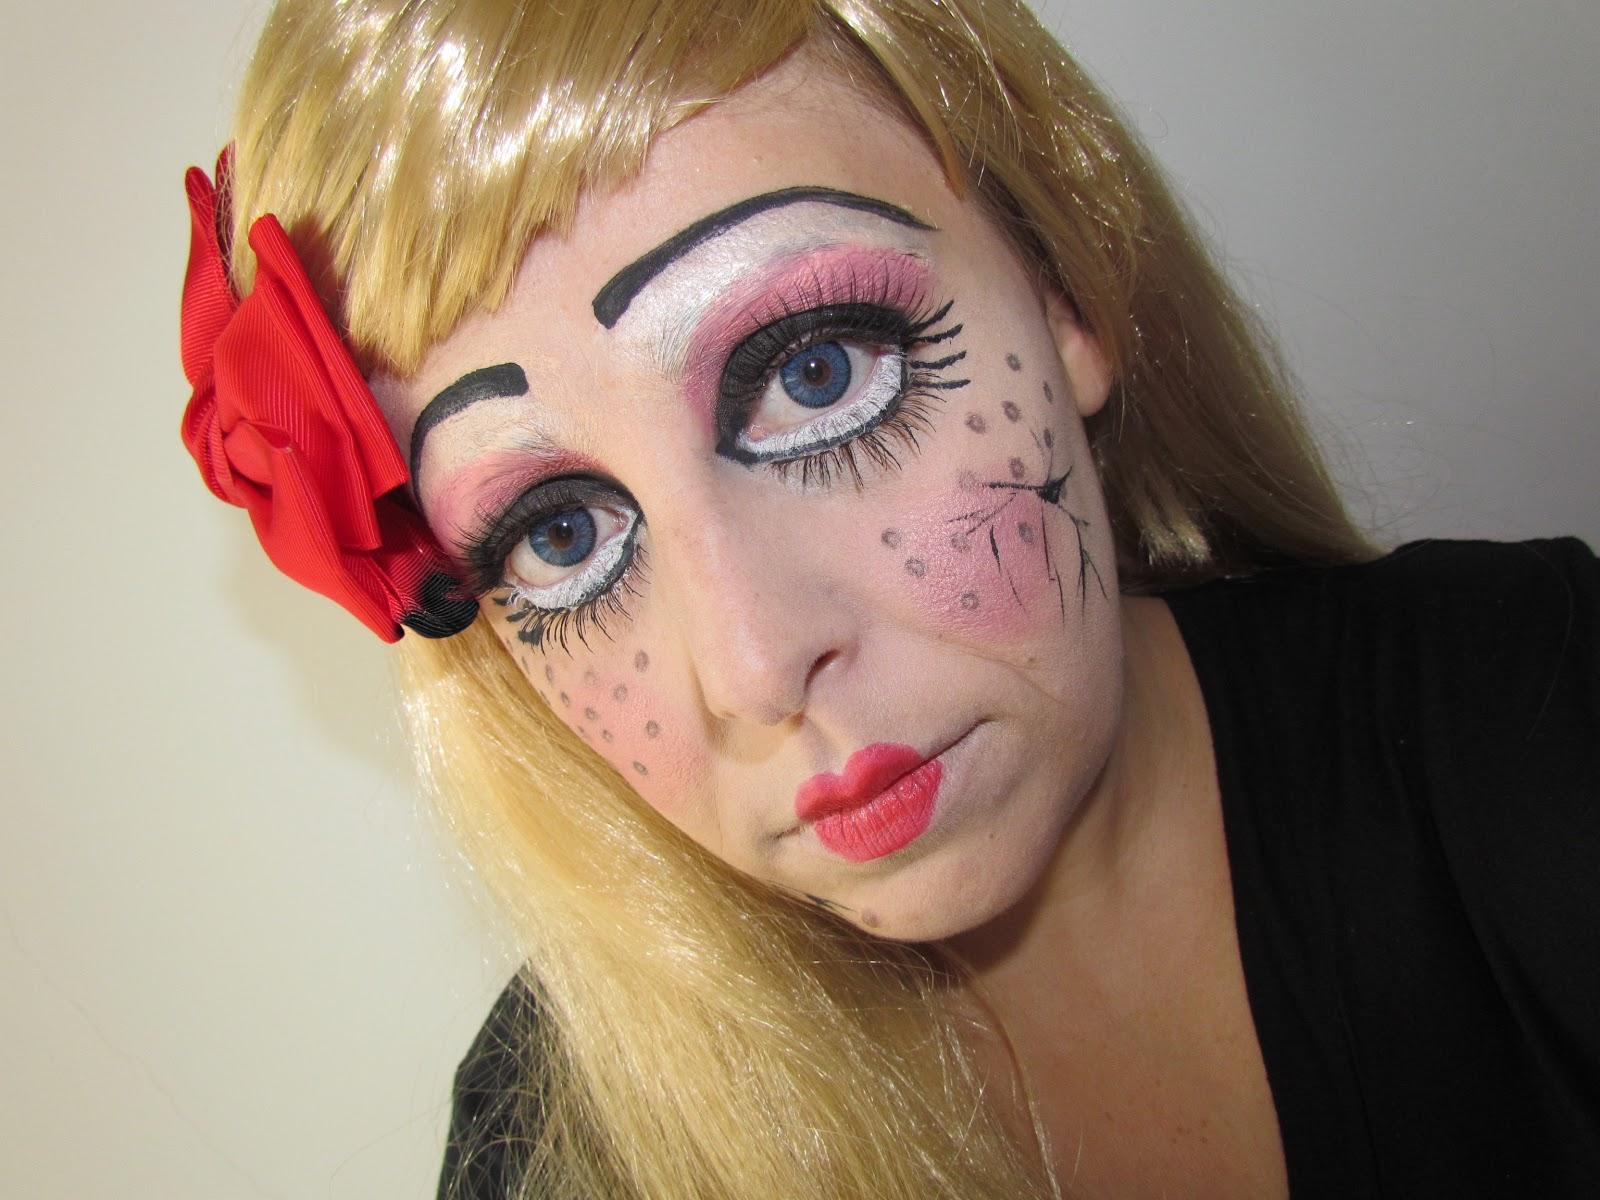 Image of gold eyes red lips makeup kit makeup and hair